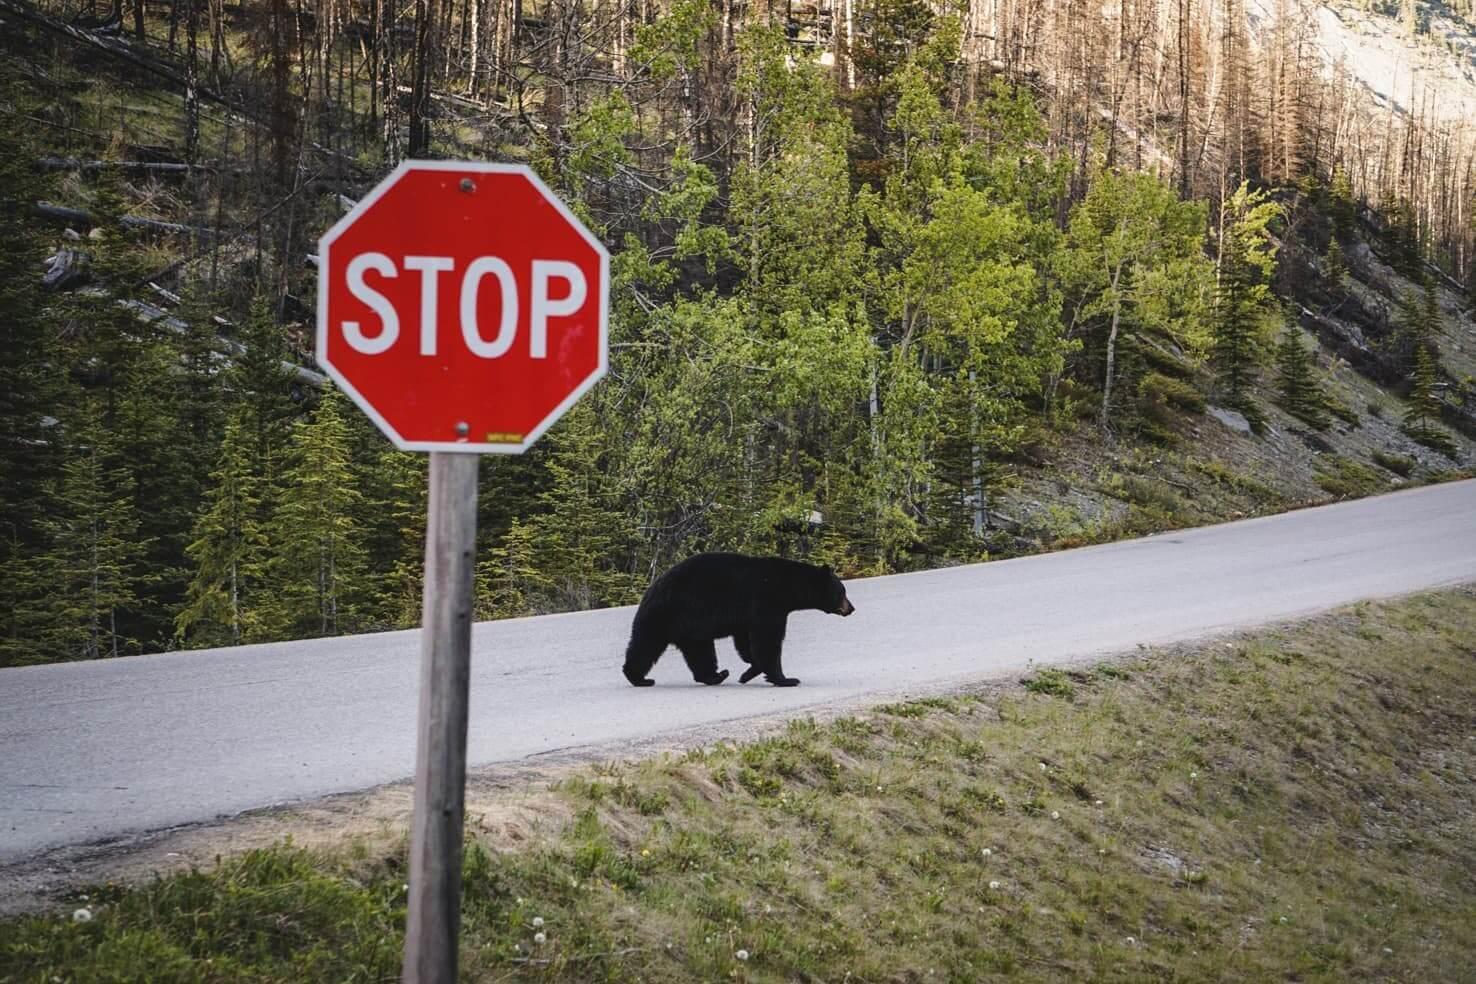 Canadian Rockies road trip itinerary - Bleack Bear in Jasper National Park